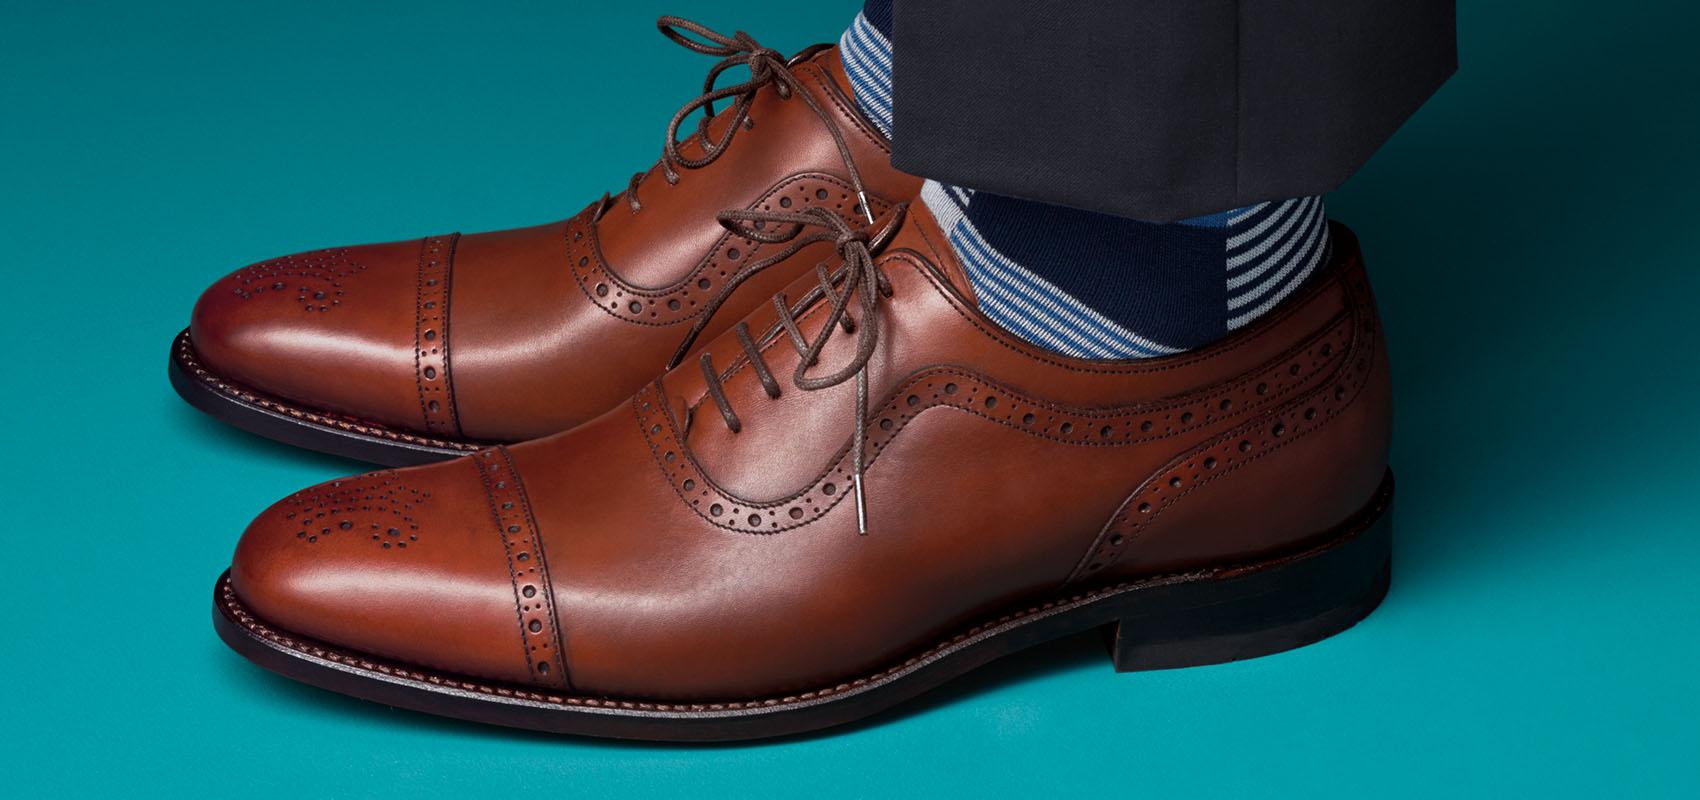 Charles Tyrwhitt Brown Shoes